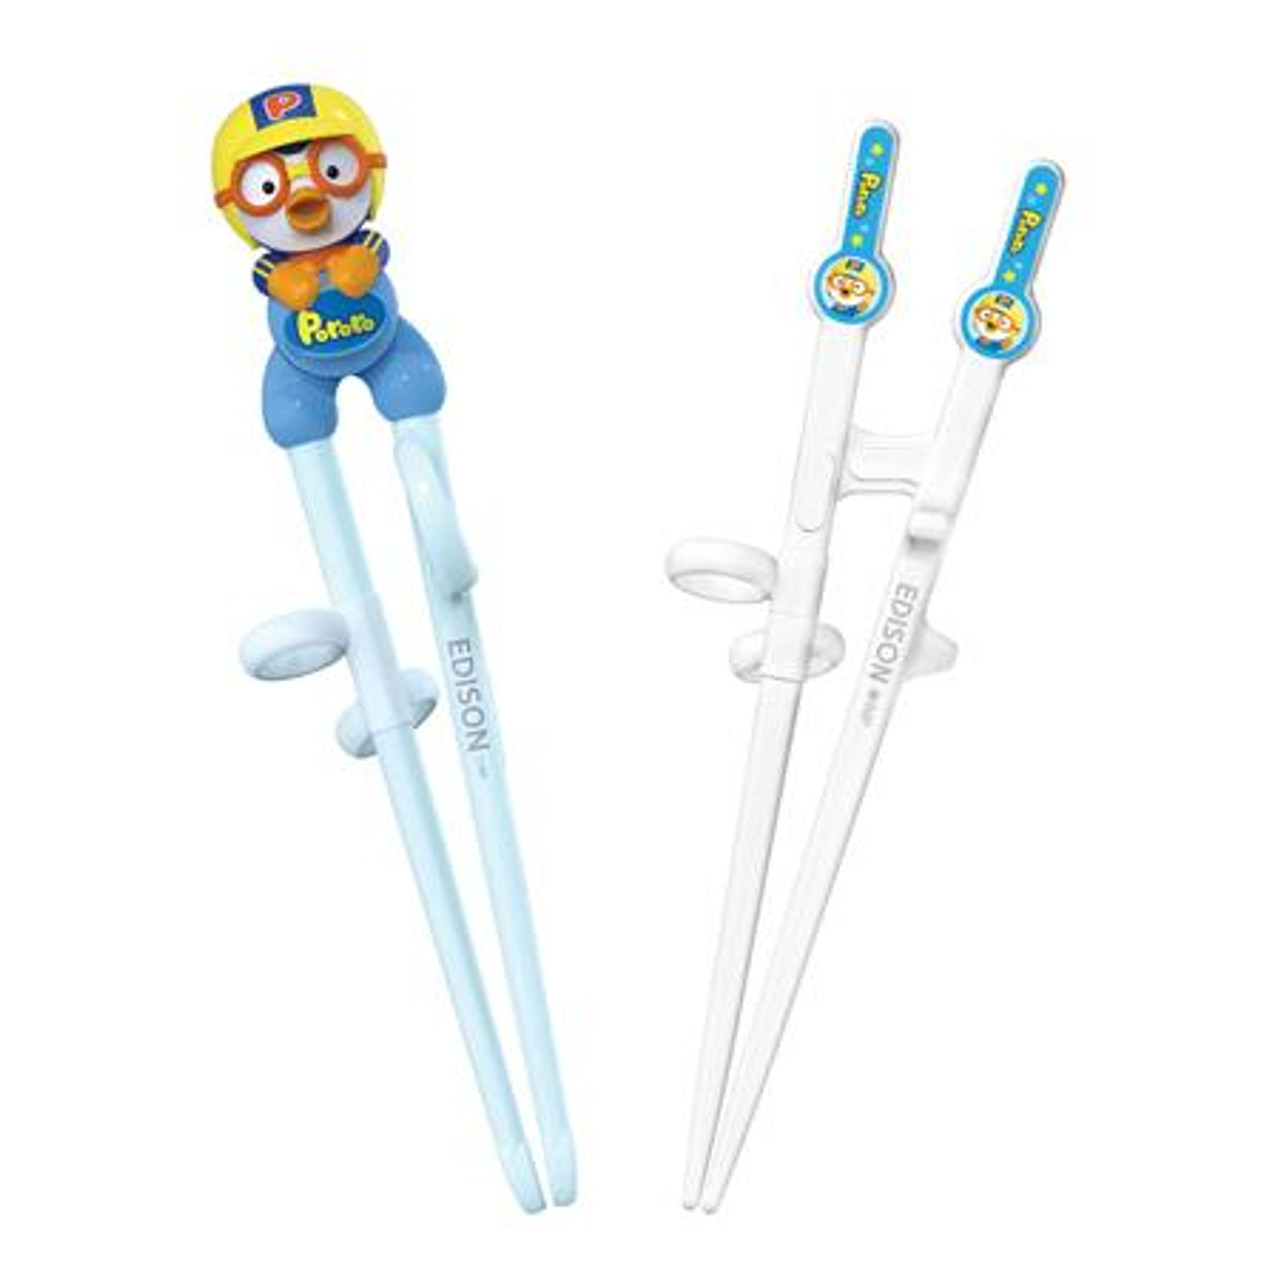 Petty Edison Training Chopsticks for Children